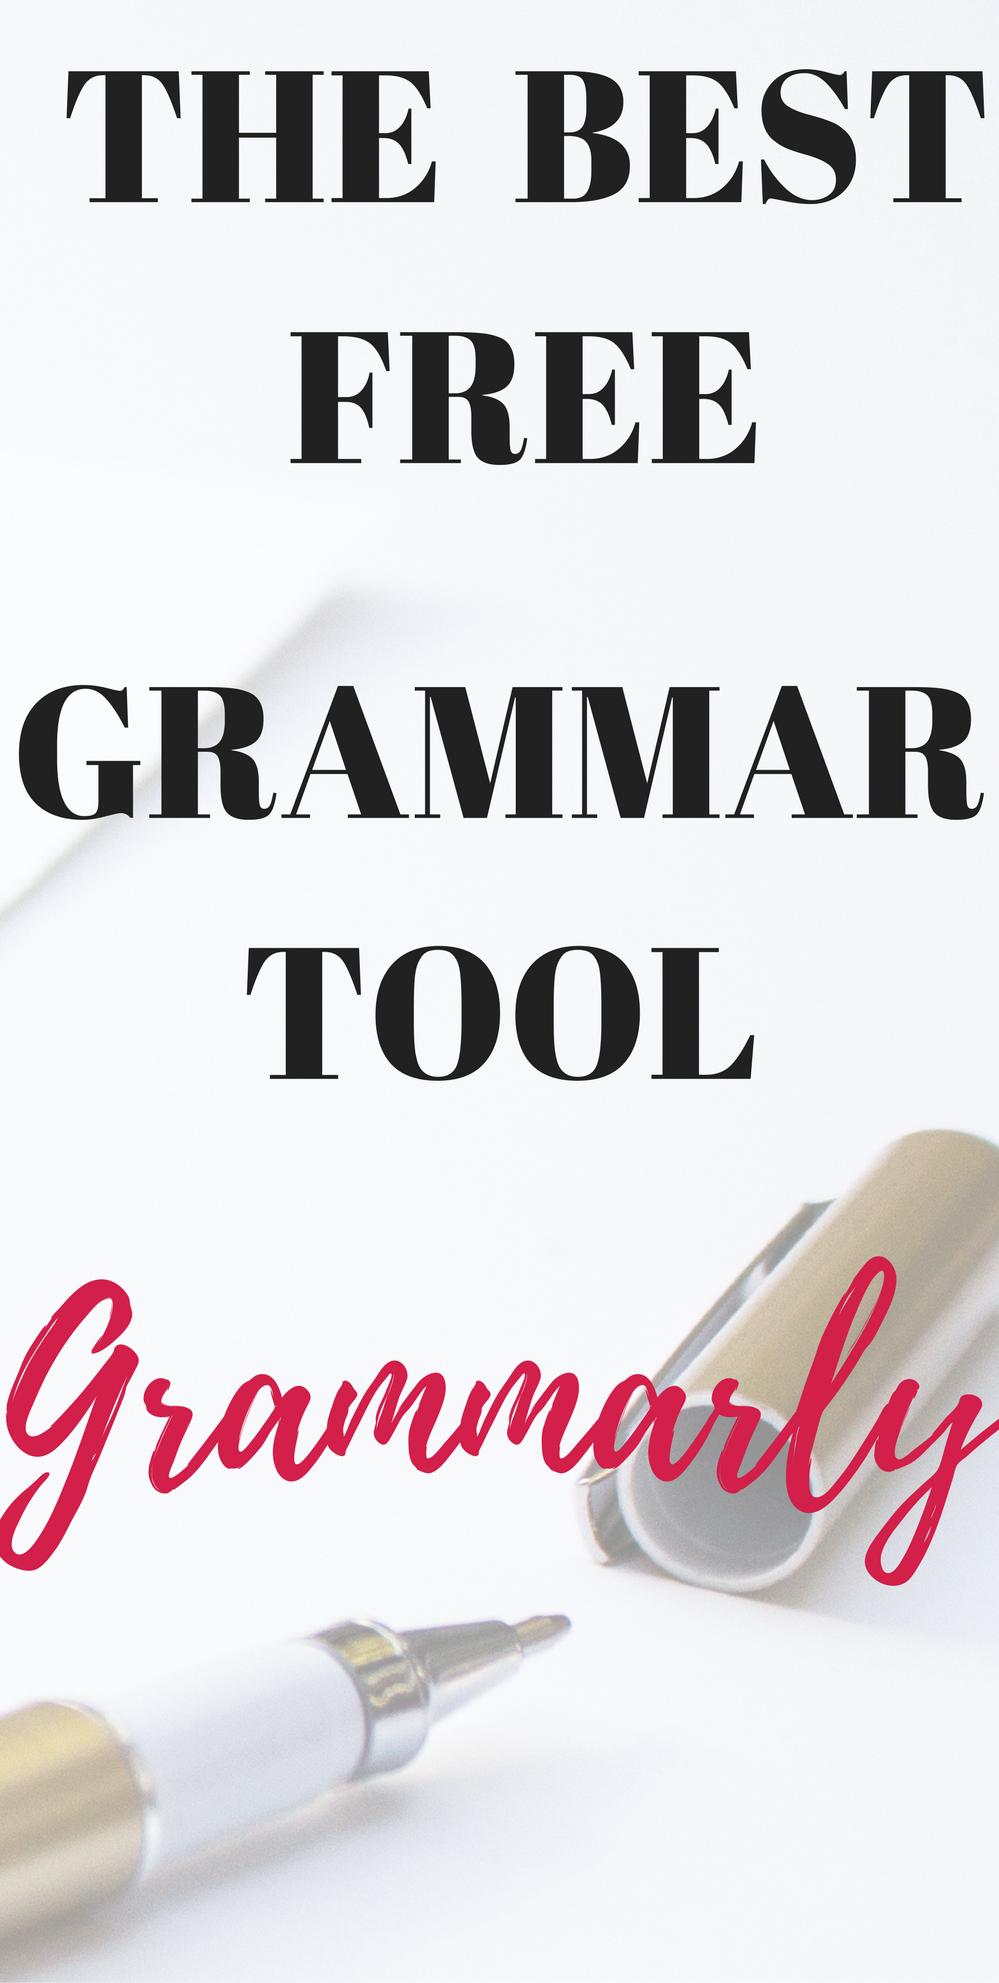 Grammarly a free grammar tool